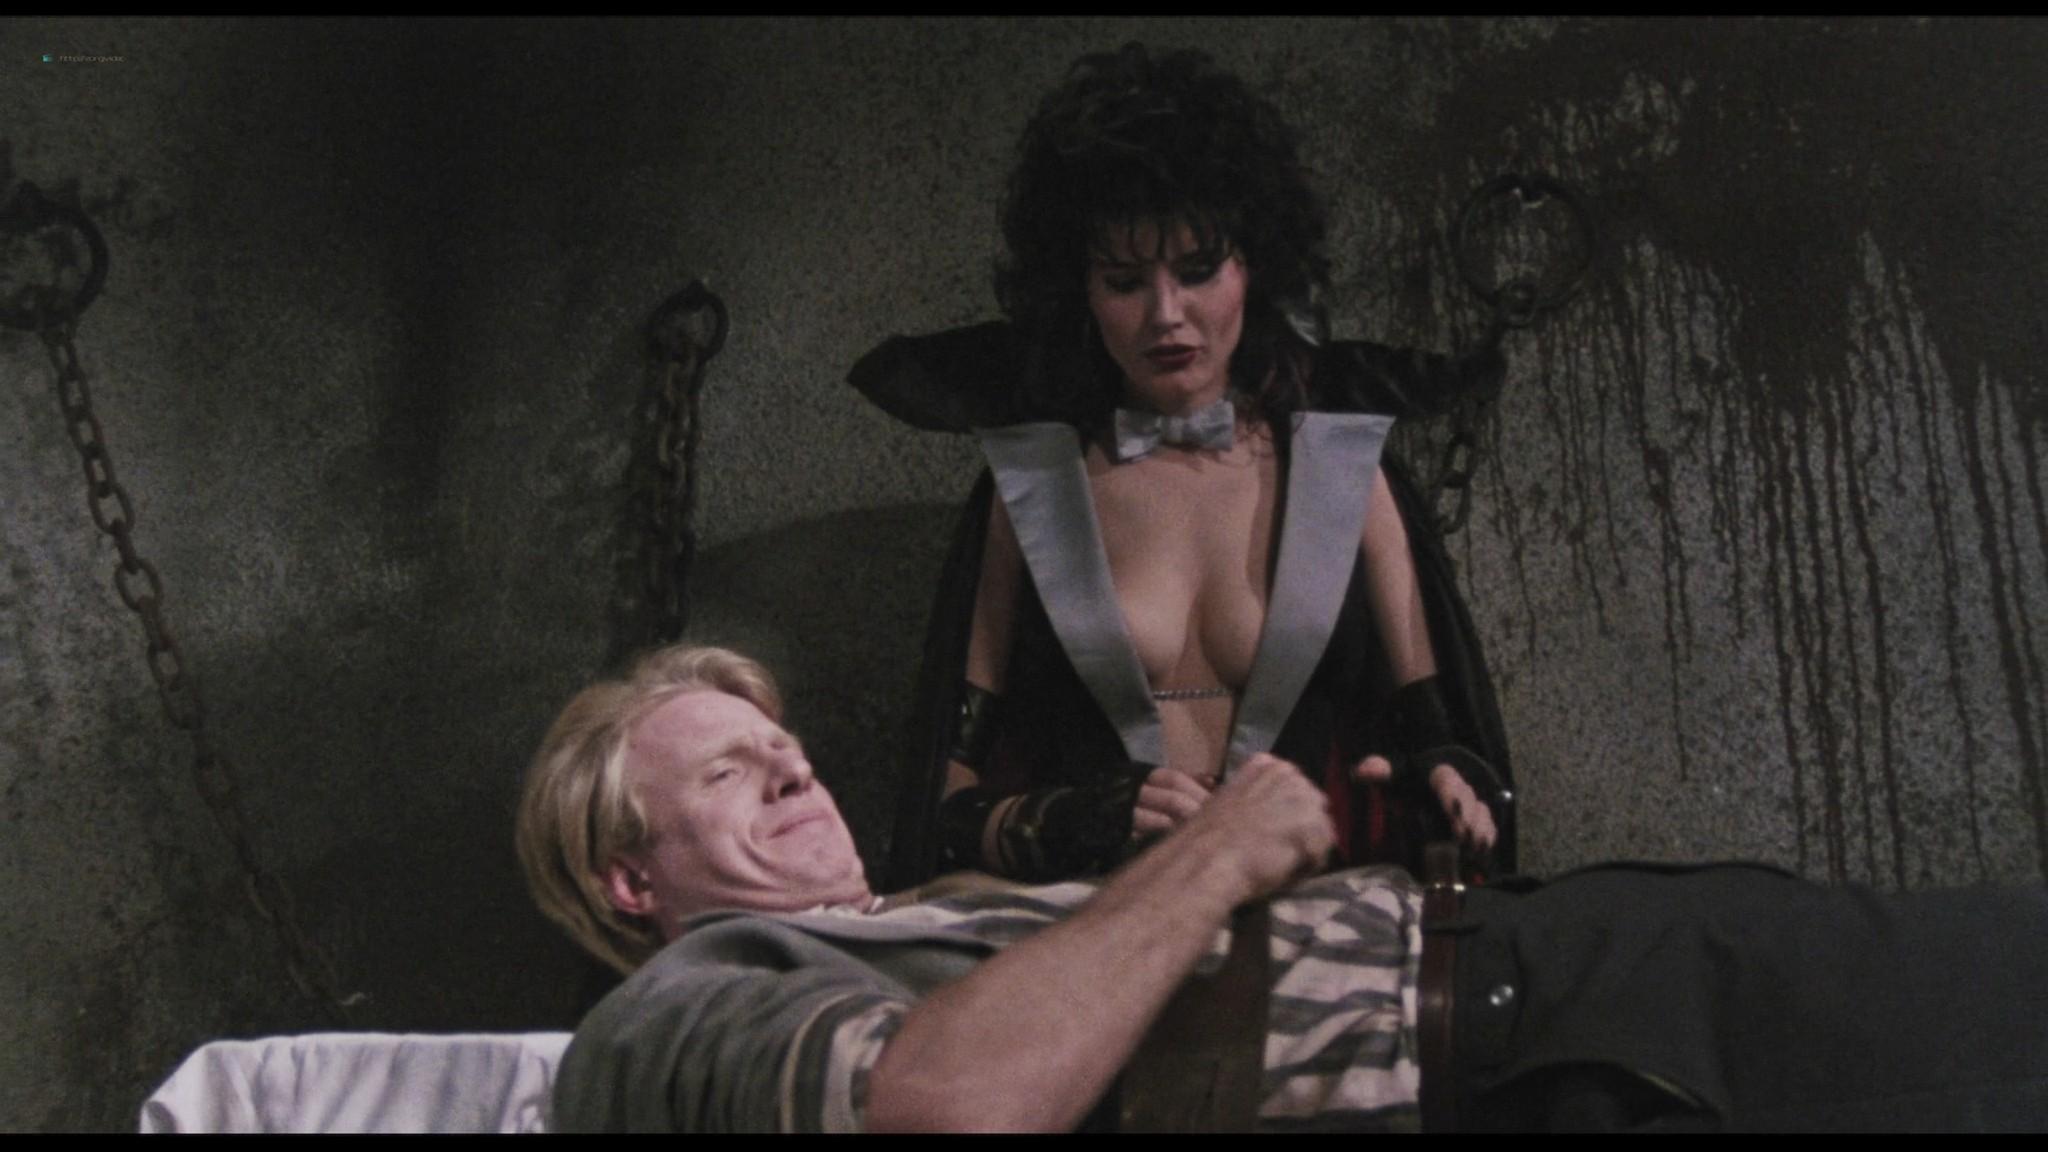 Geena Davis hot and sexy Ksenia Prohaska sexy - Transylvania 6-5000 (1985) HD 1080p BluRay (5)